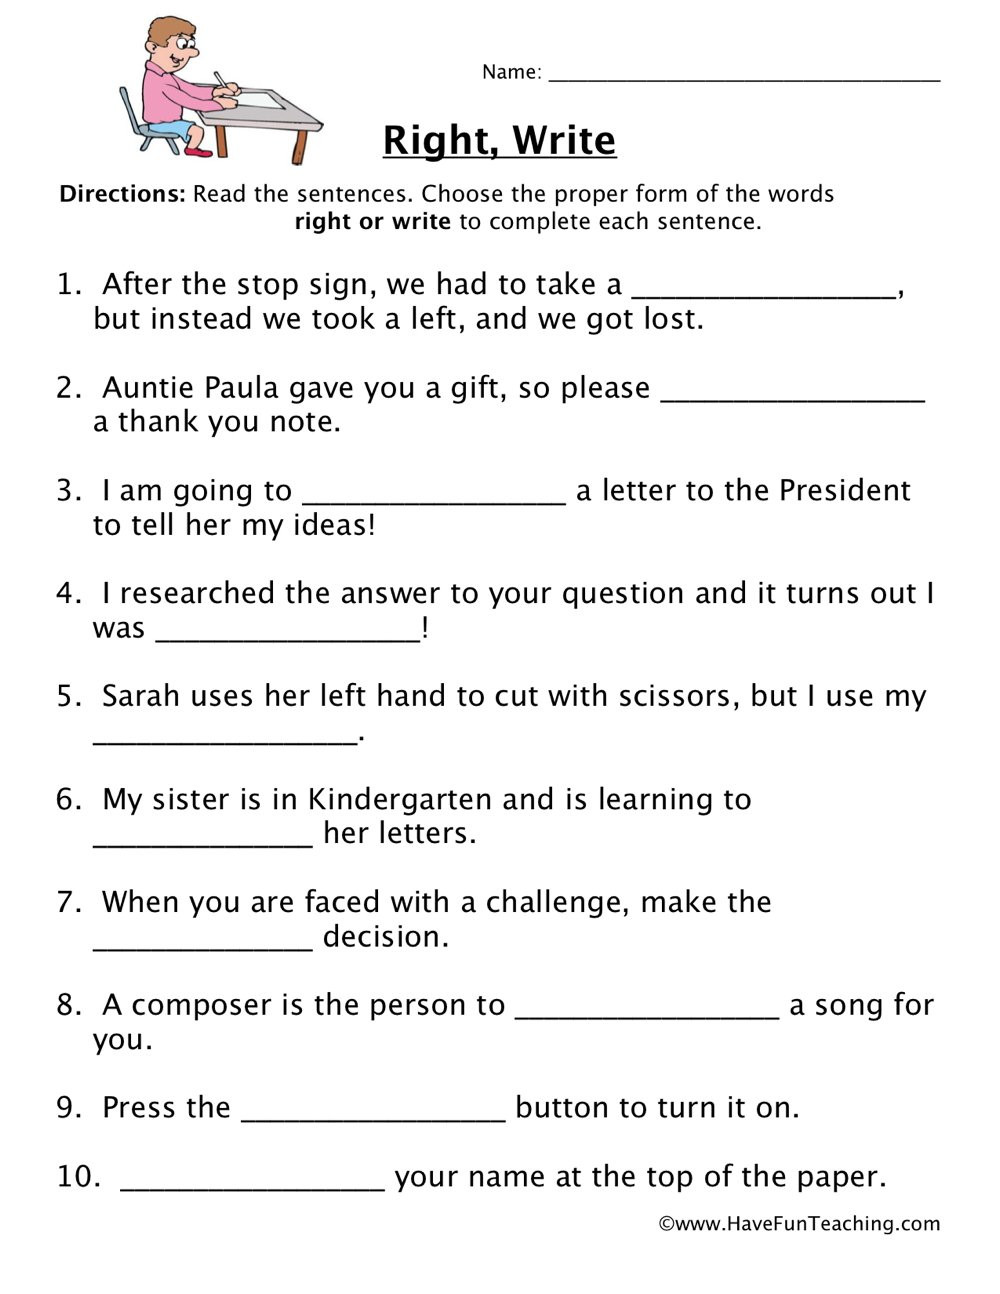 Homophone Worksheets 5th Grade Right Write Homophones Worksheet